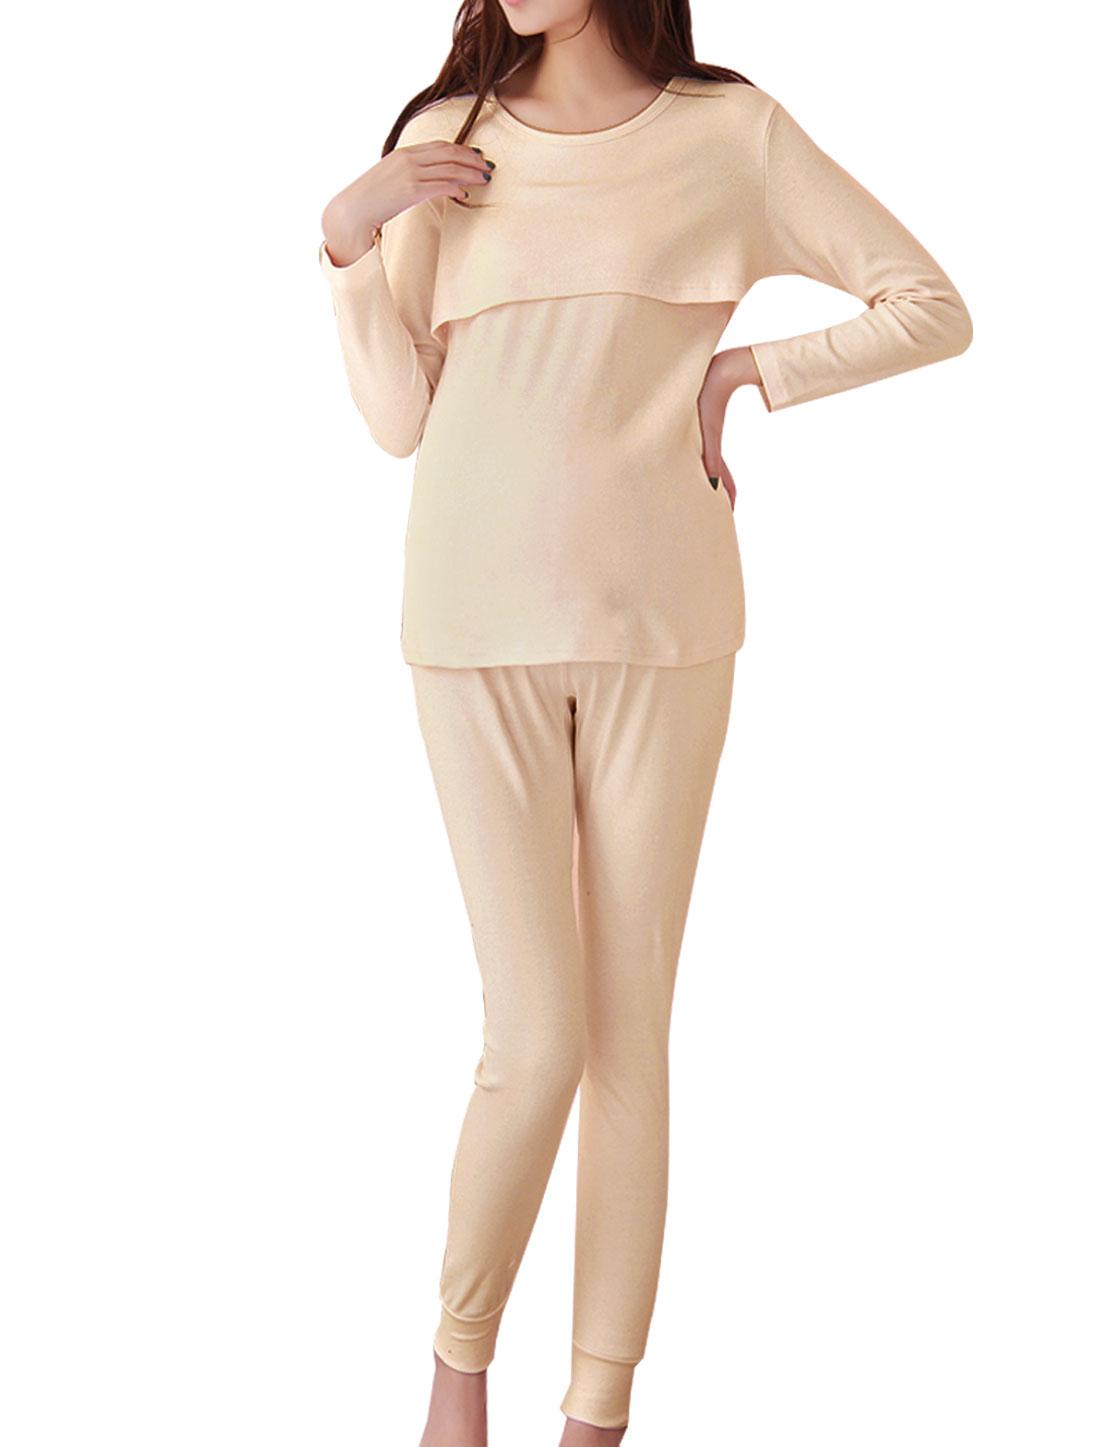 Motherhood Beige Long Sleeve Solid Color Top Shirt w Elastic Waist Pants Trousers S